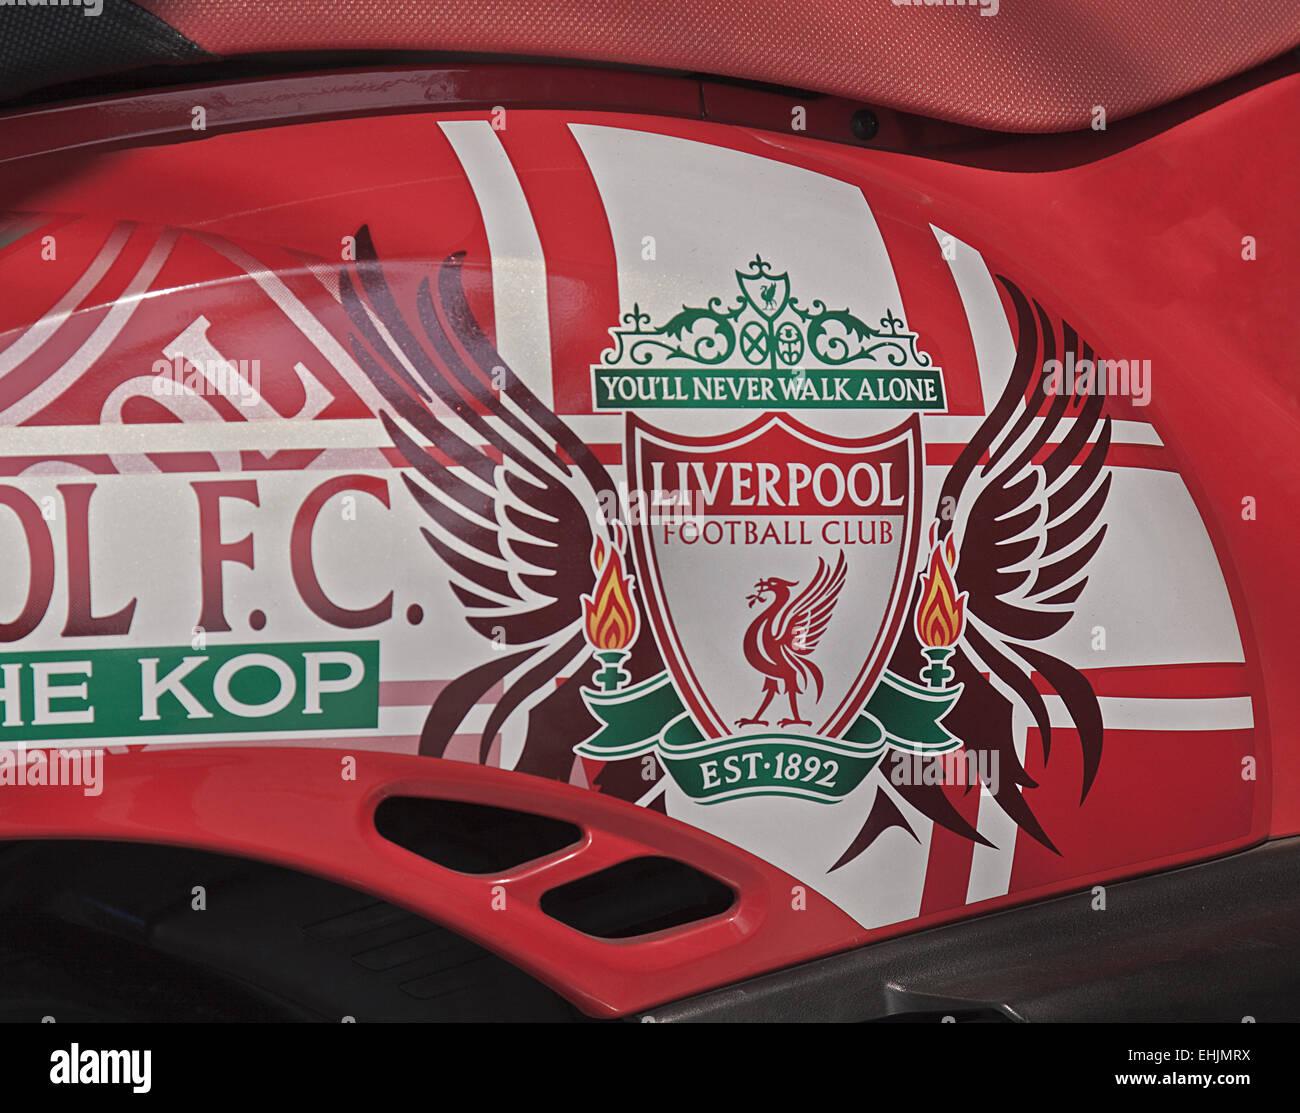 Liverpool FC - Stock Image